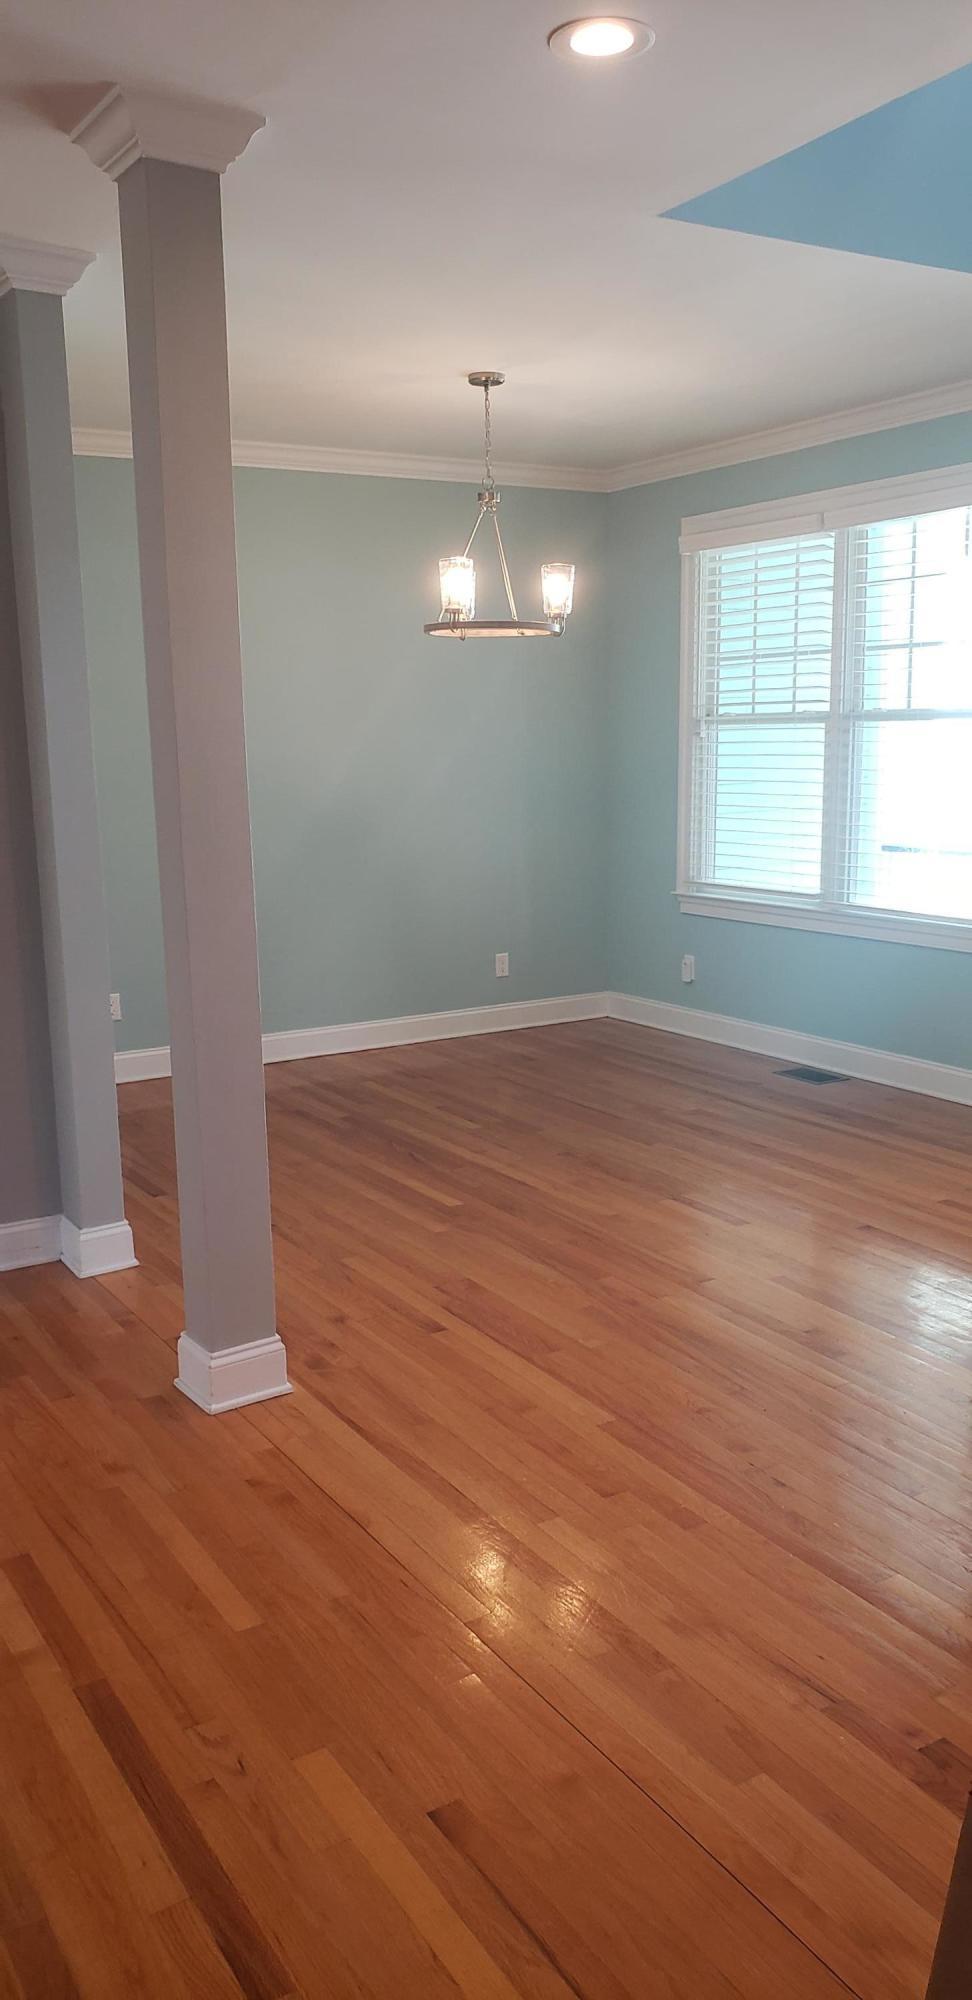 Laurel Lakes Homes For Sale - 1305 Woodlock, Mount Pleasant, SC - 2